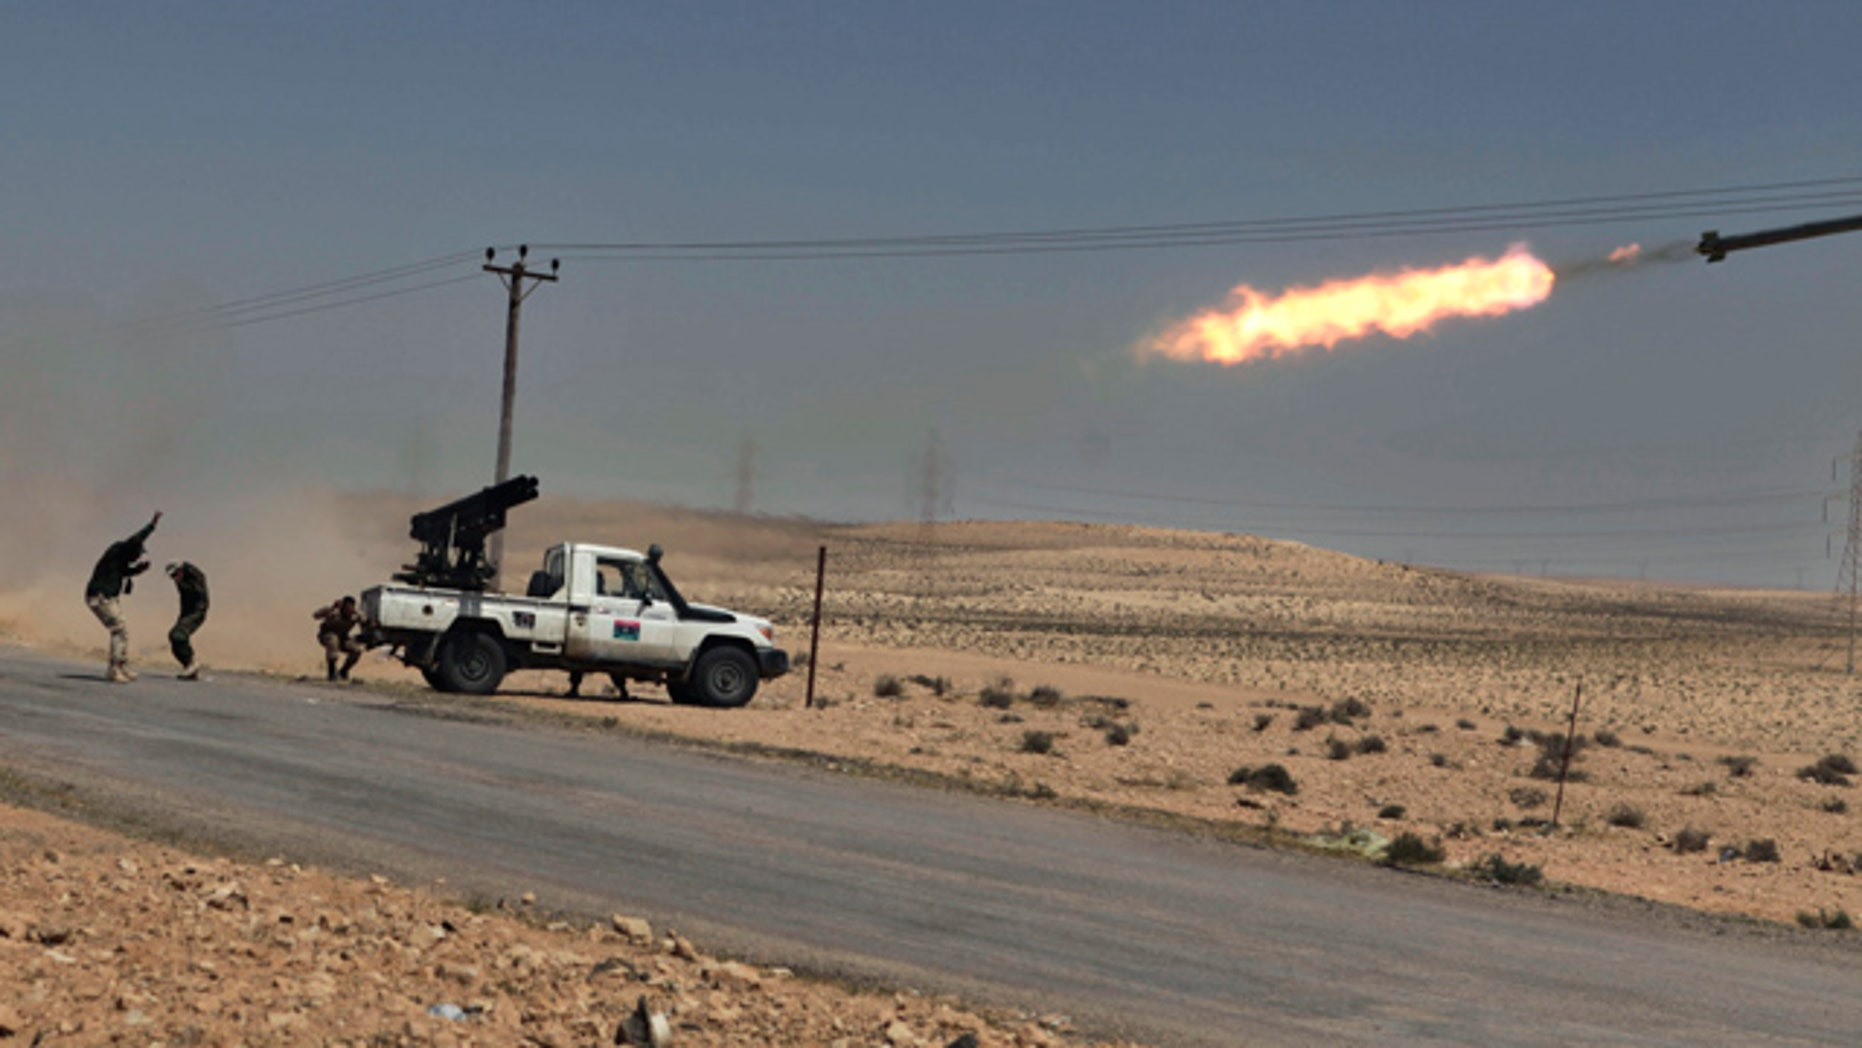 April 5: Libyan rebels shell pro Qaddafi positions just outside Brega, Libya.